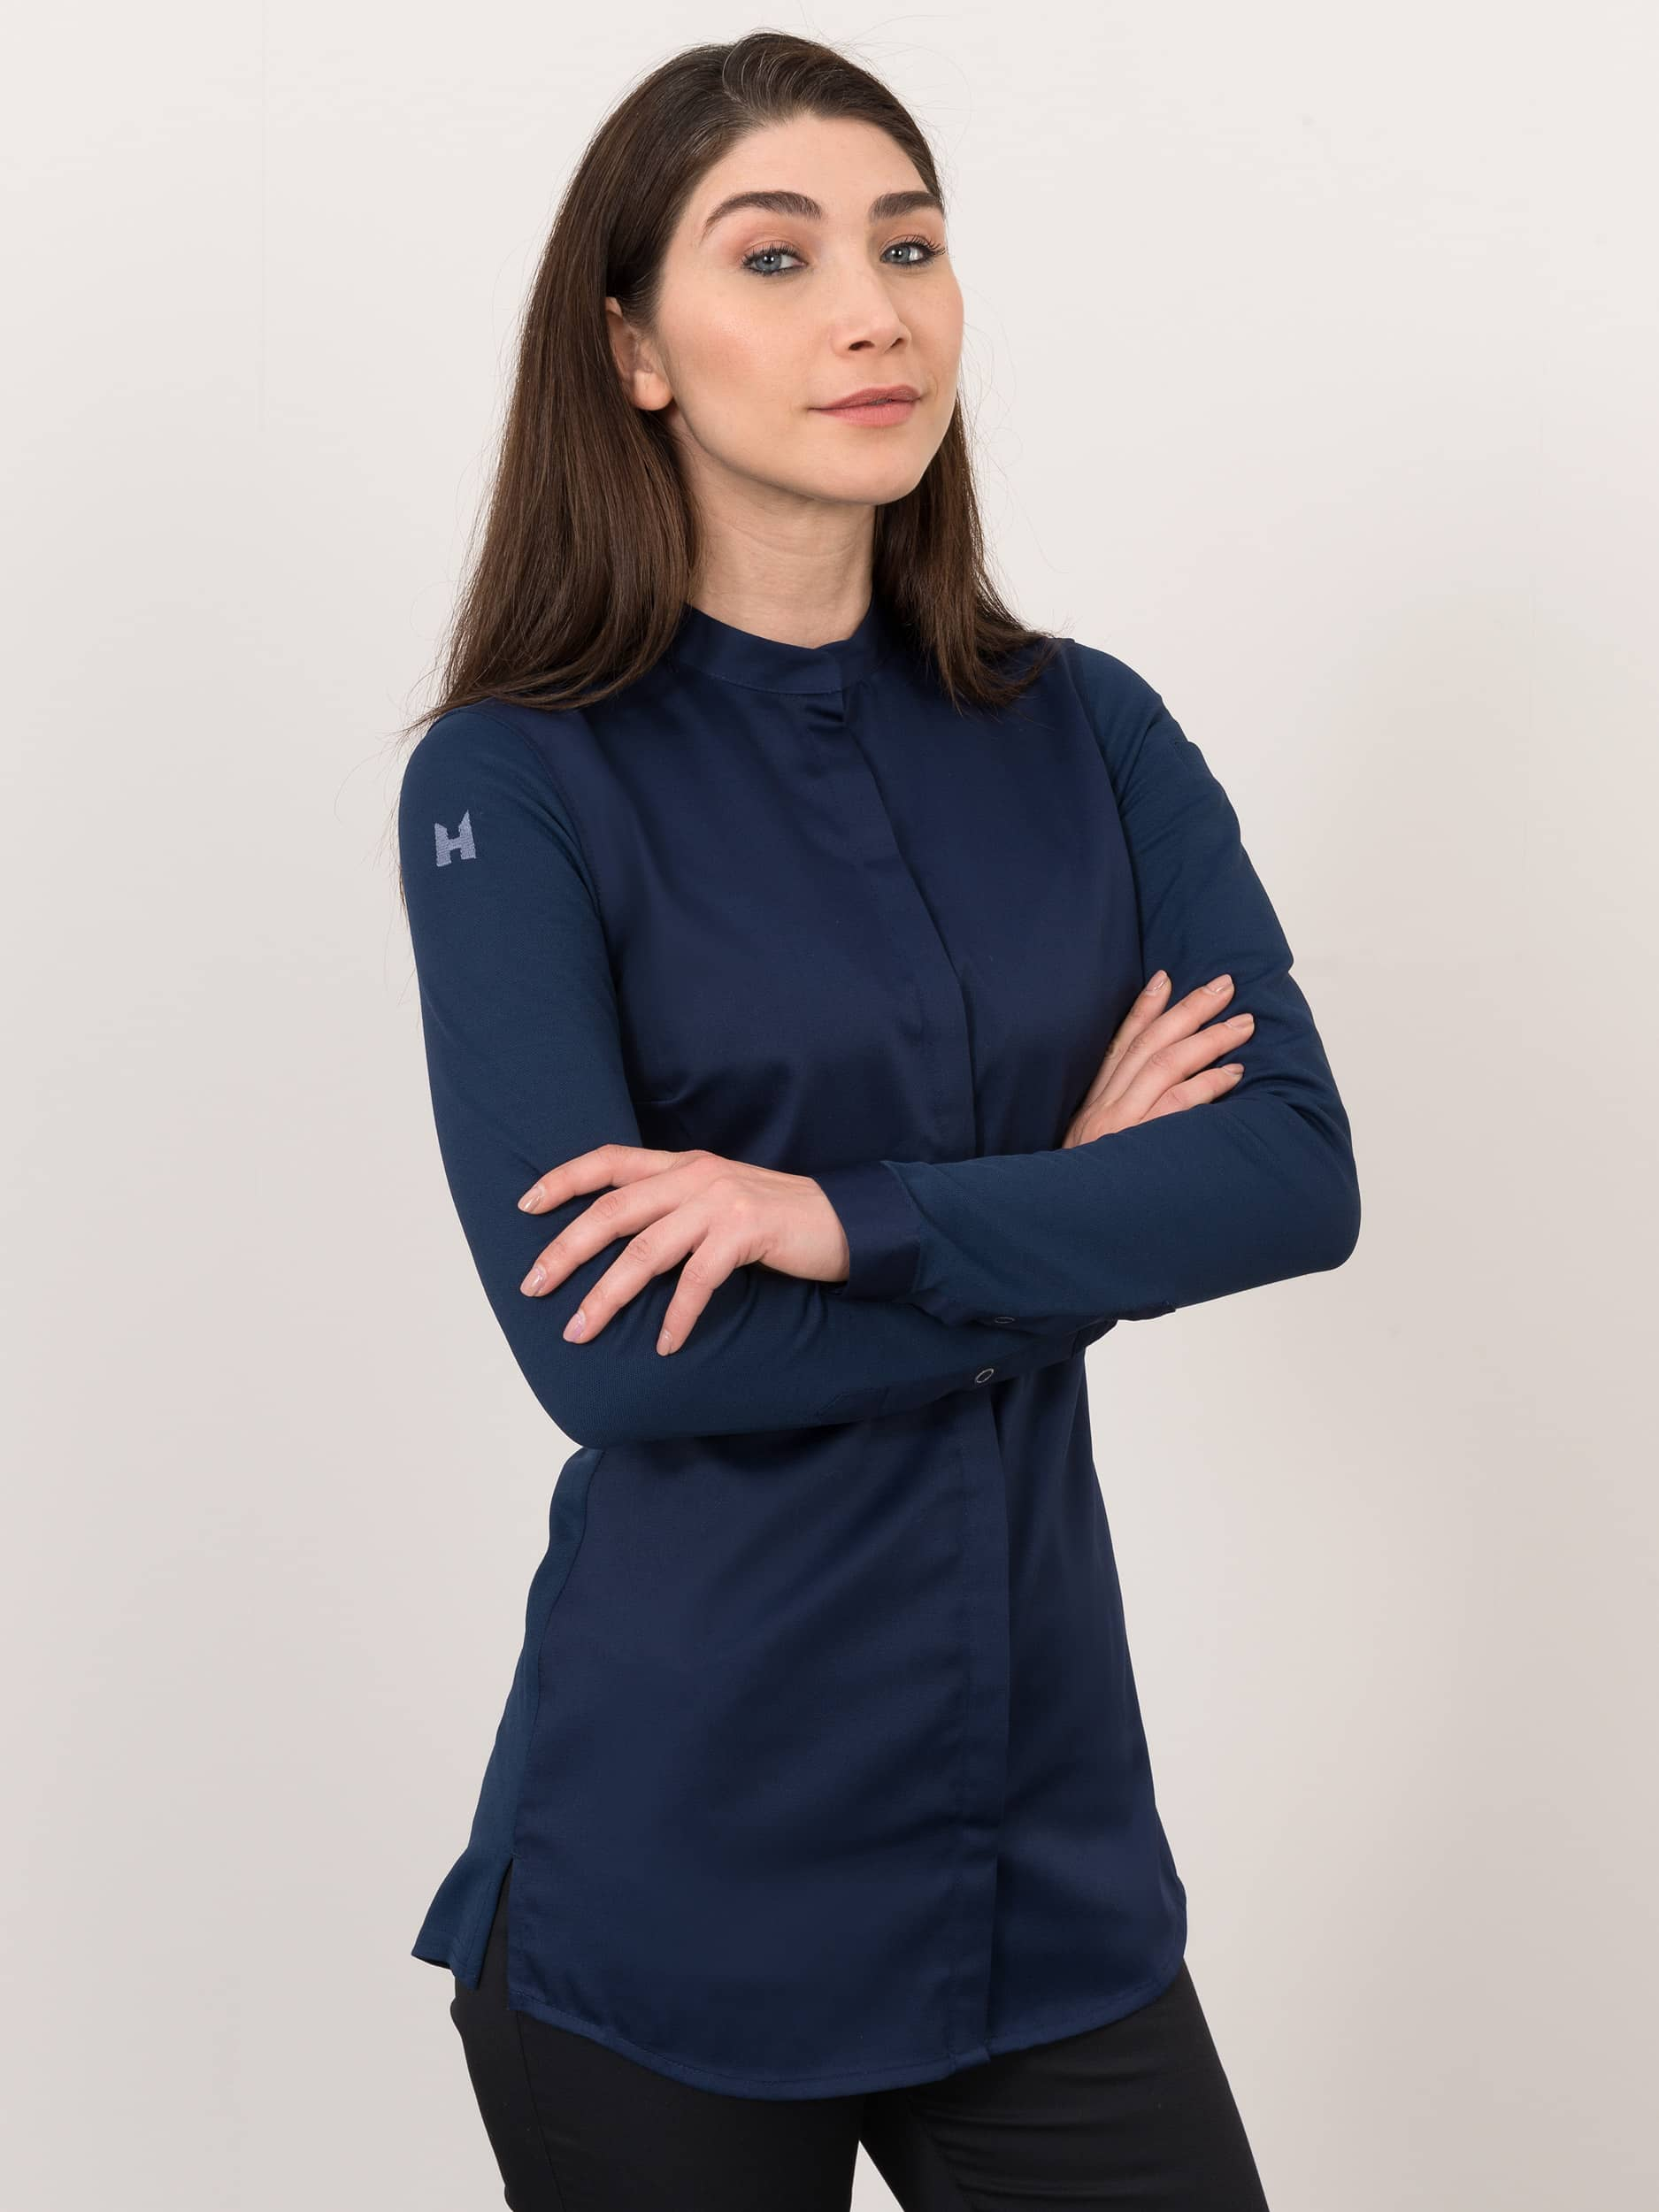 Chef Jacket Jolie Patriot Blue